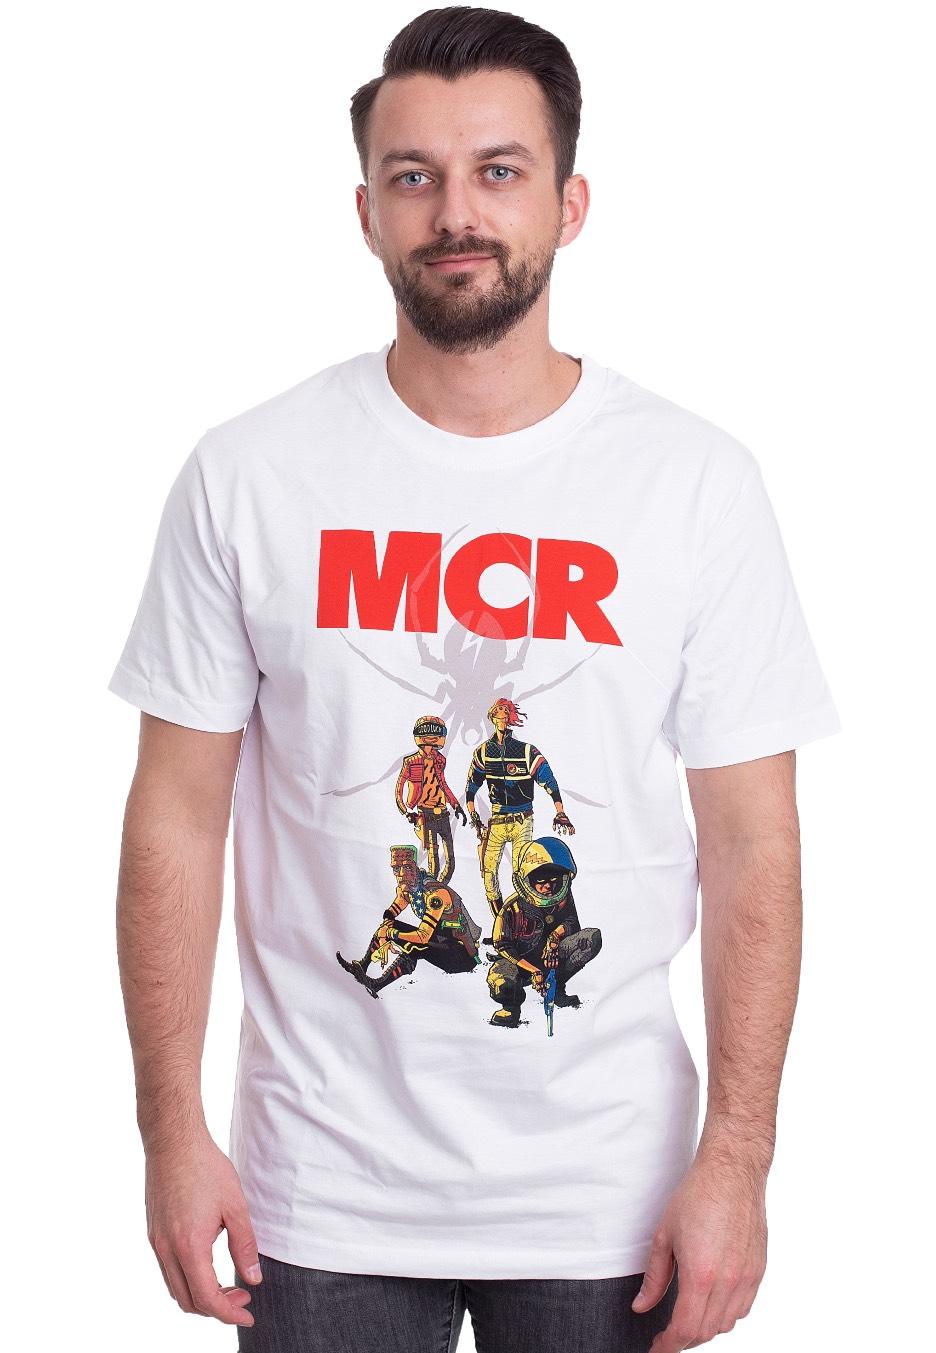 ba34df54 My Chemical Romance - Killjoys Pinup White - T-Shirt - Official Alternative  Rock Merchandise Shop - Impericon.com US